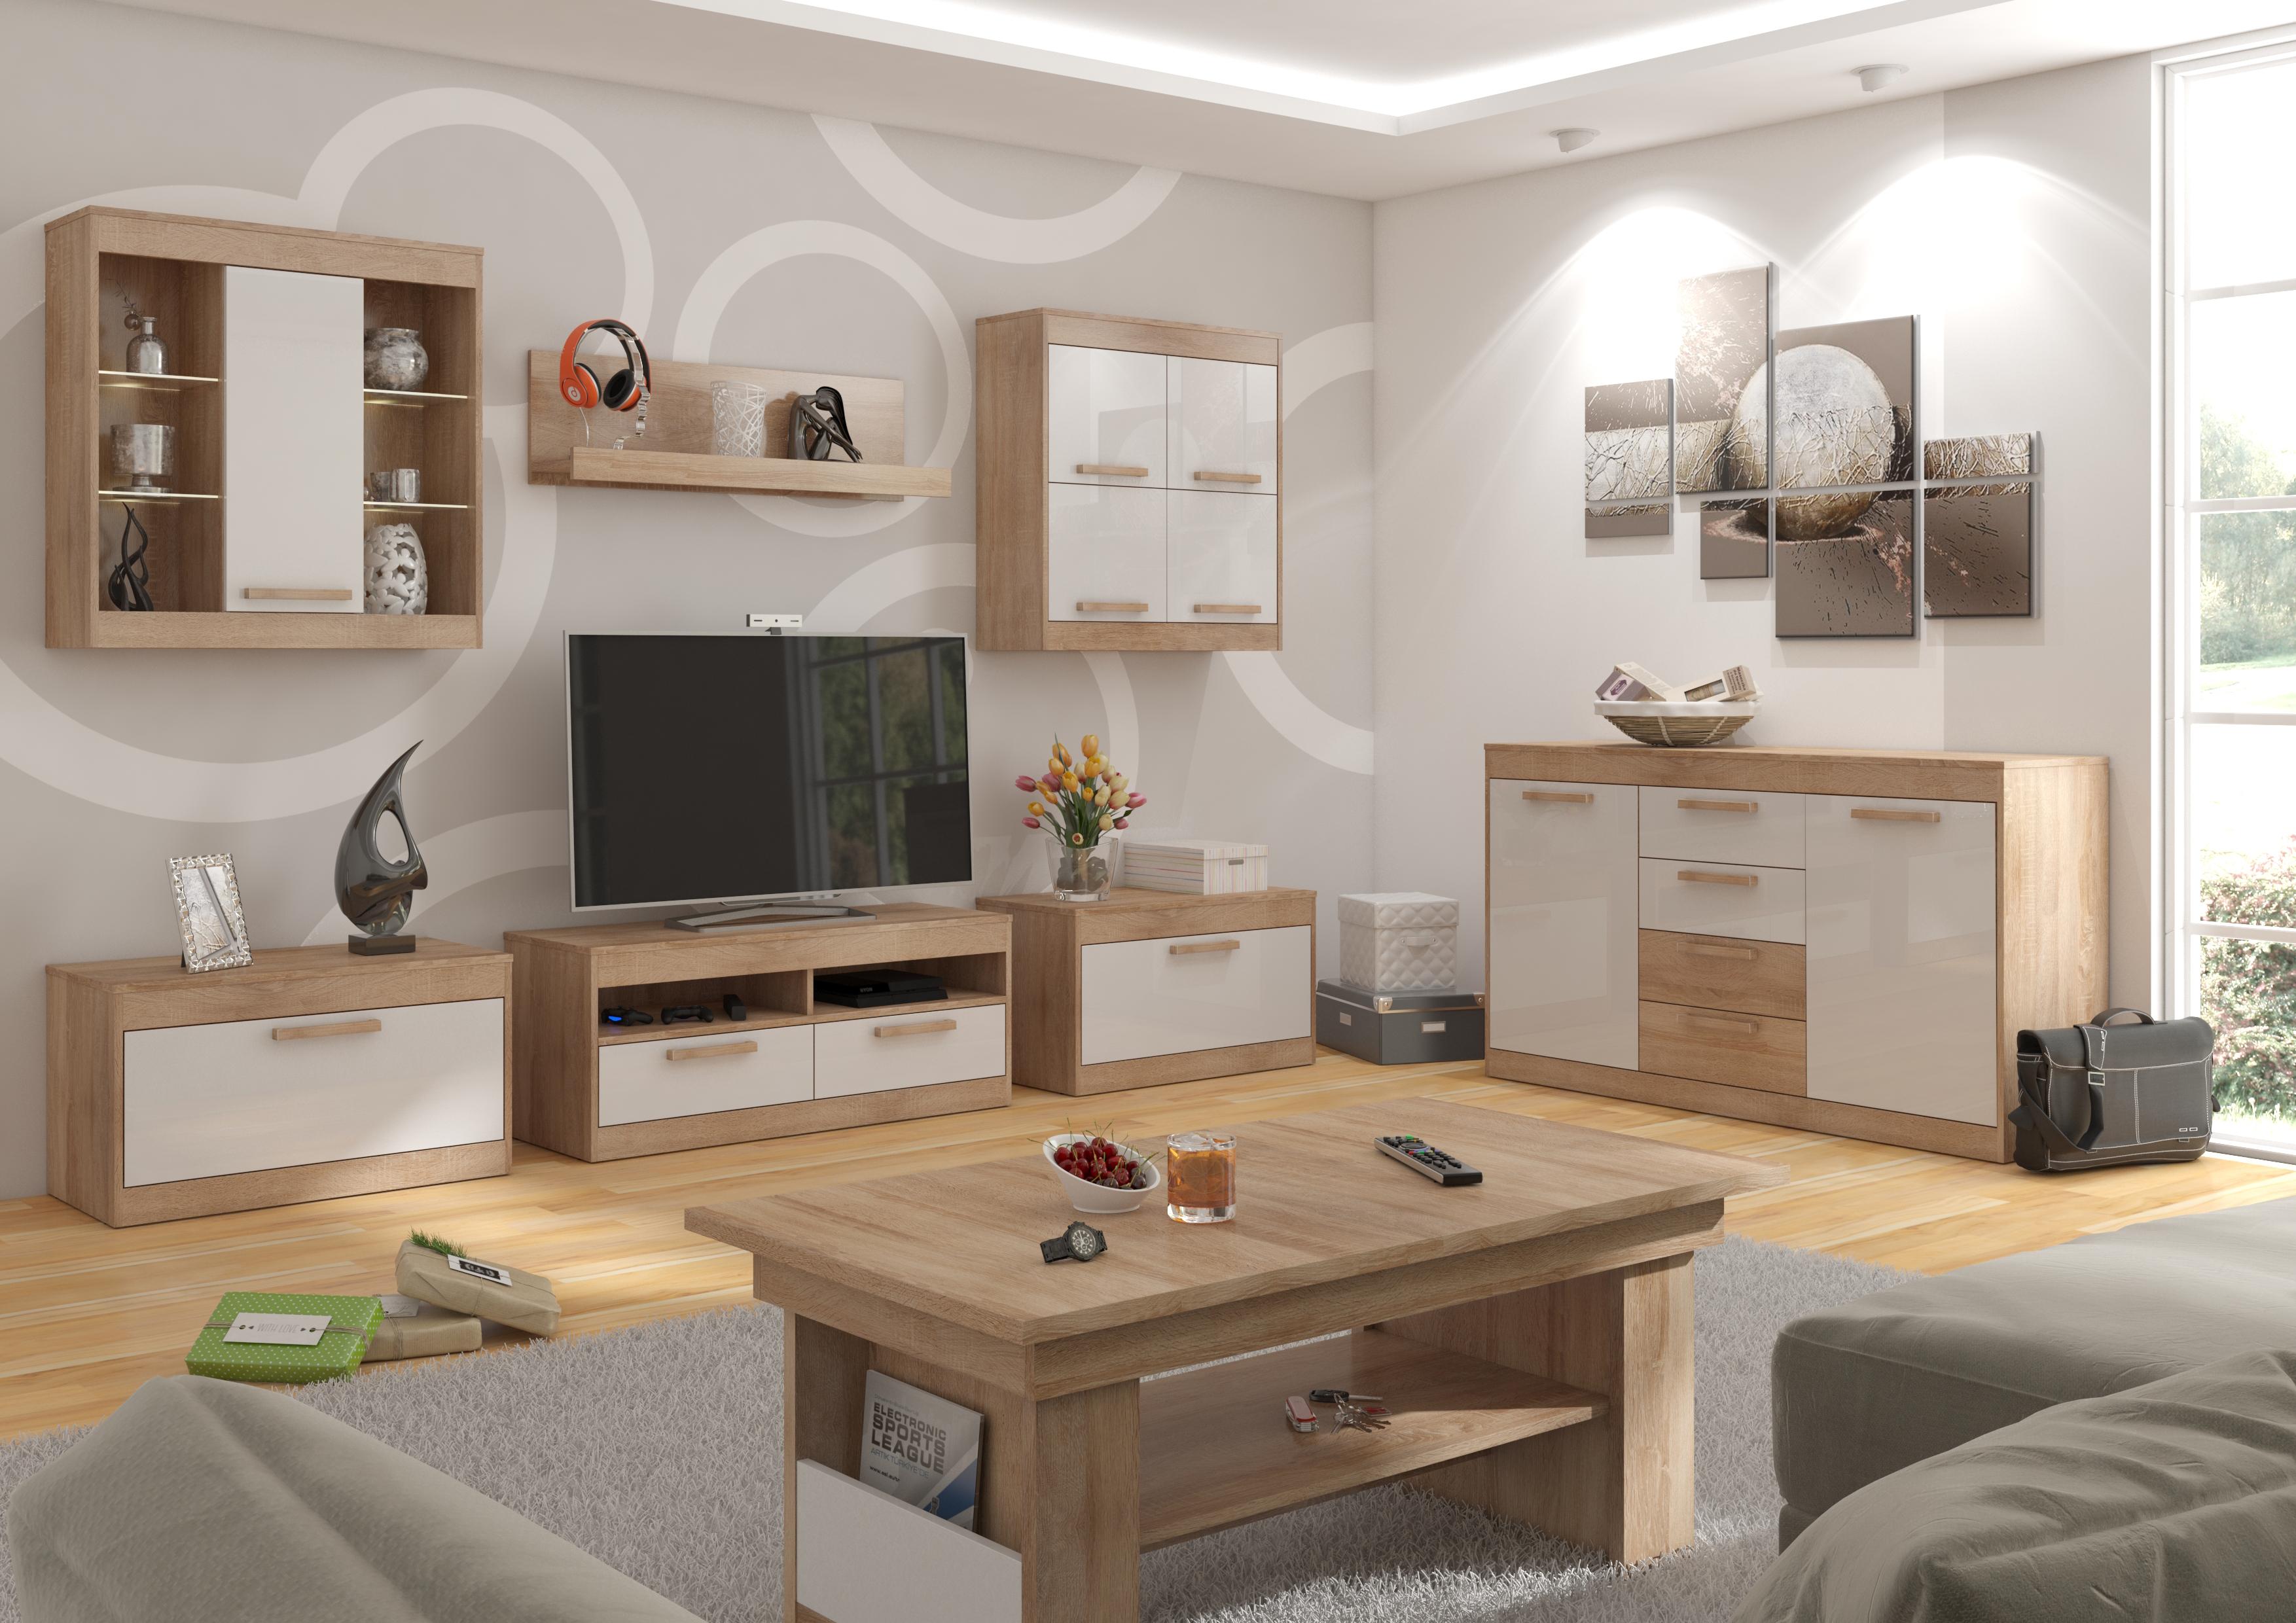 Obývací pokoj GATTON 1, dub sonoma/bílý lesk, 5 let záruka